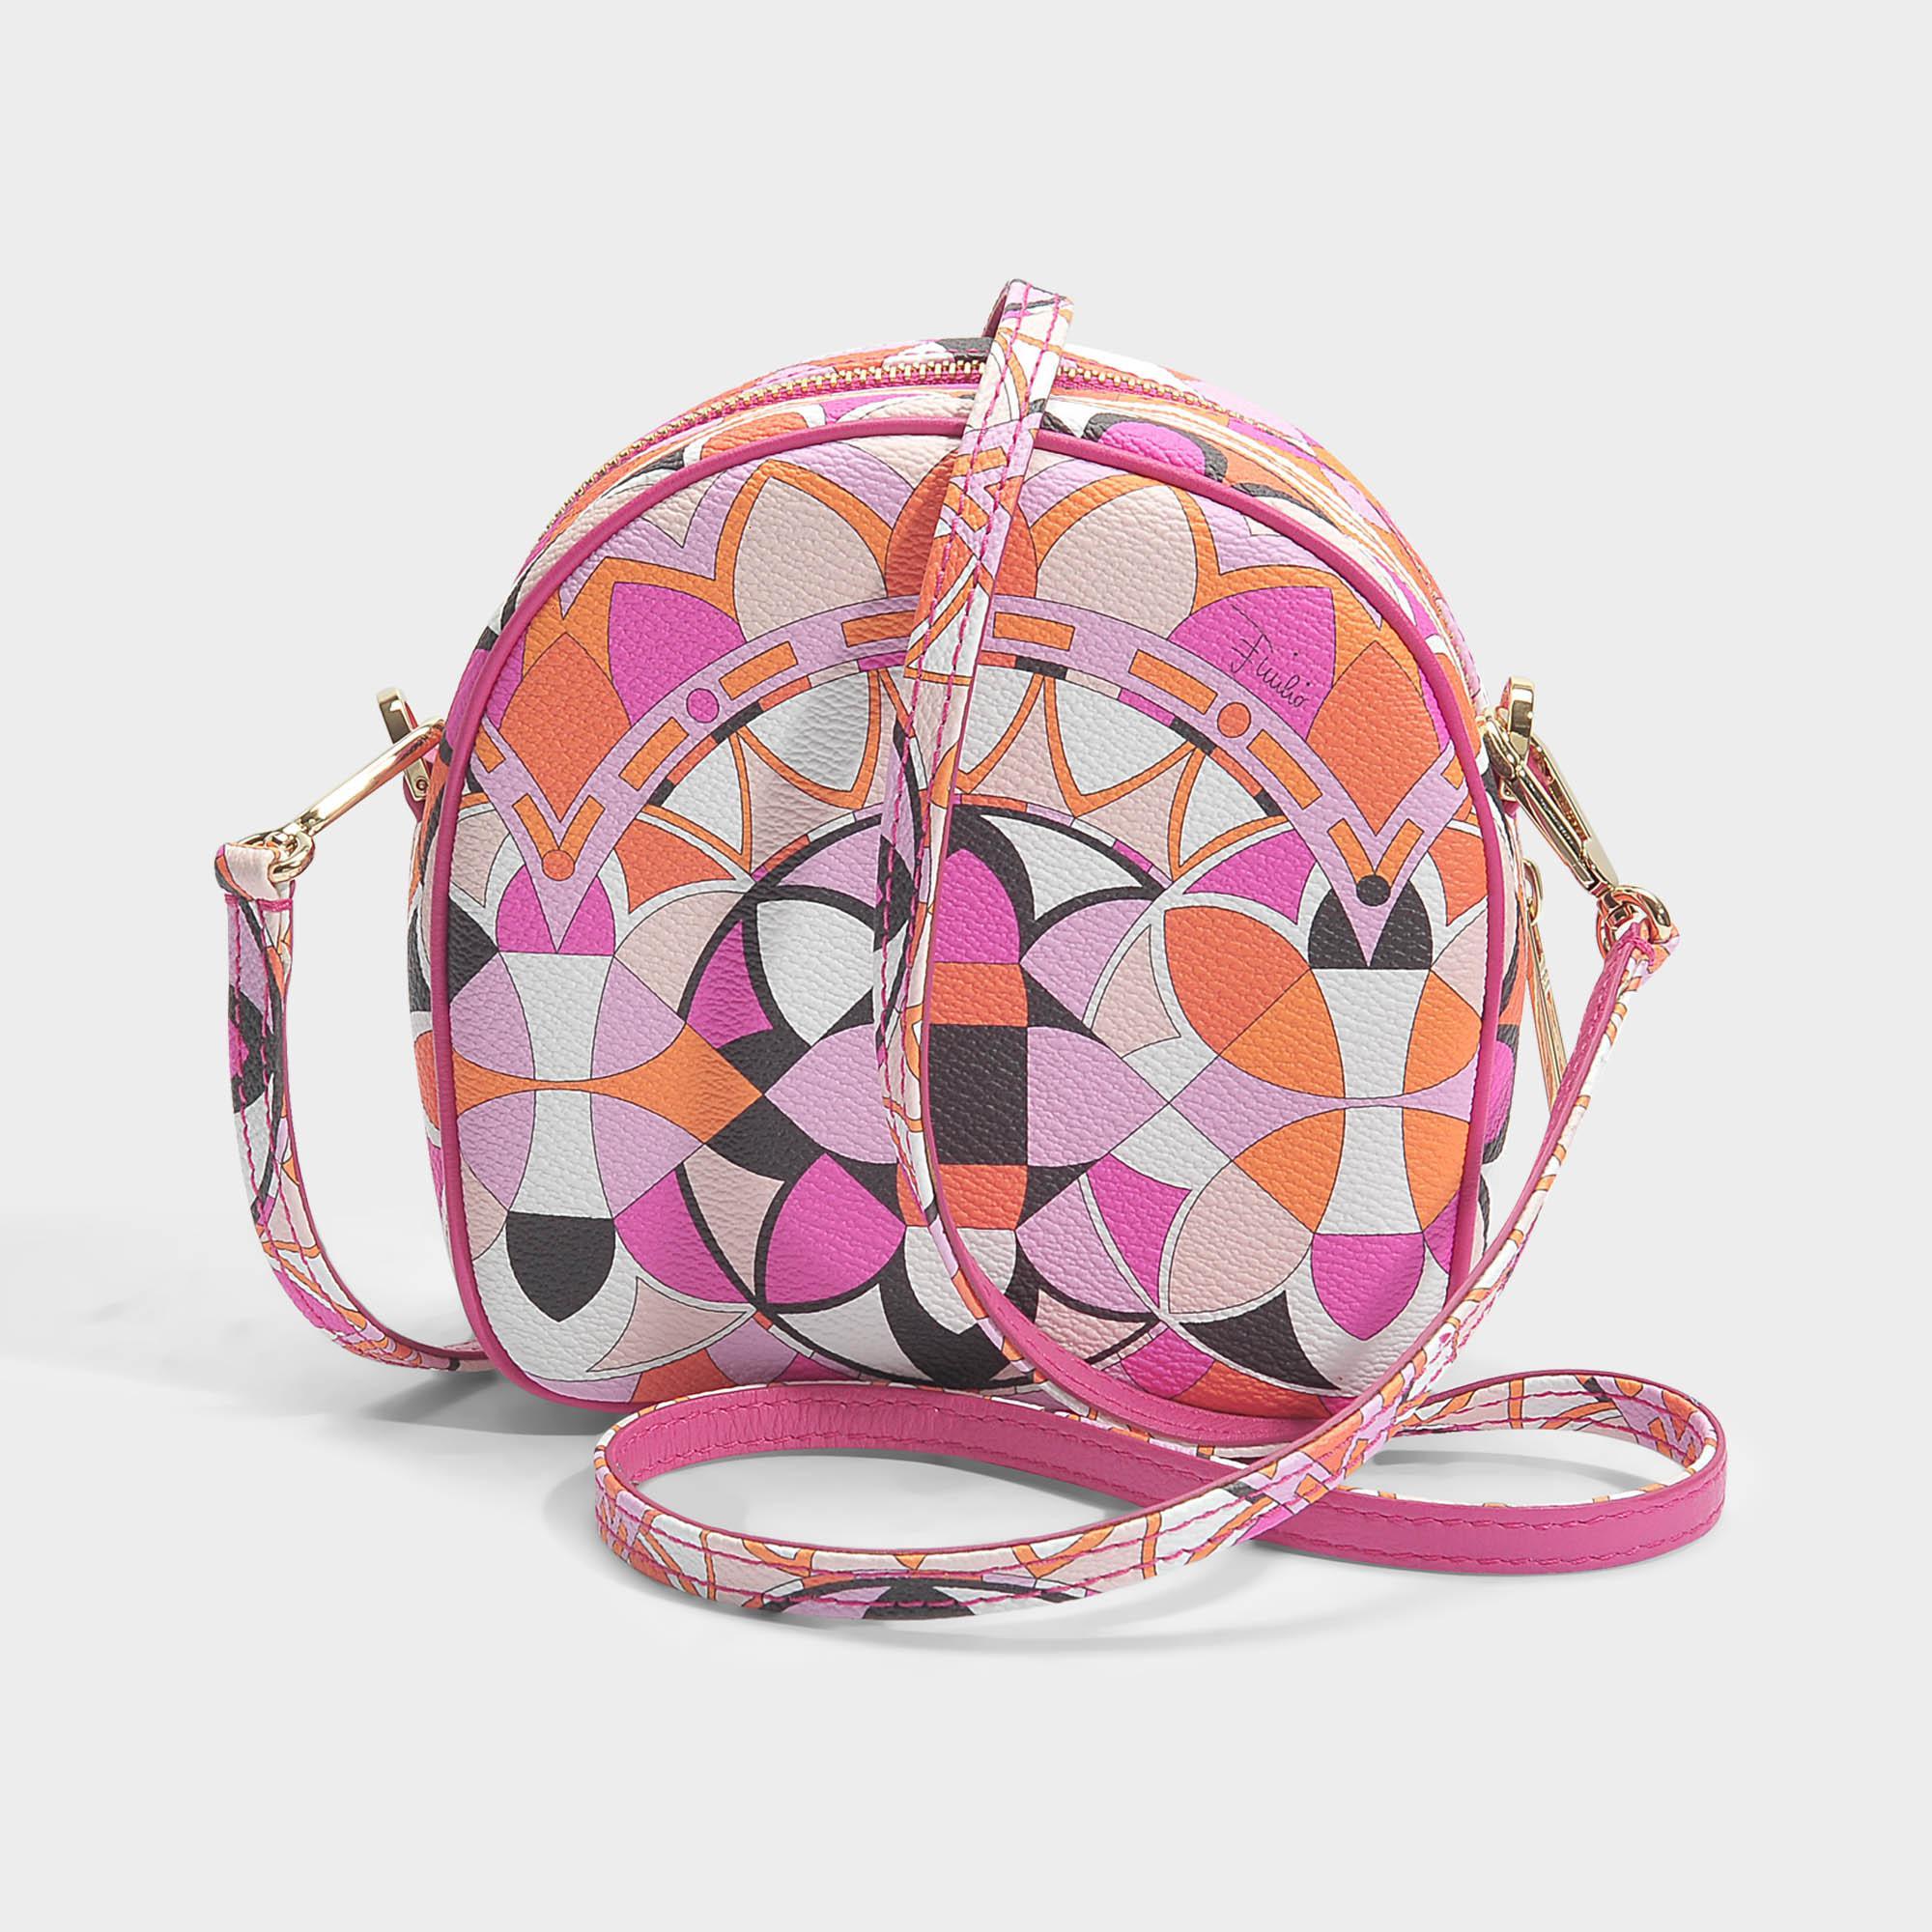 Isadora Small Hatbox Bag in Peony PVC Emilio Pucci TQNx3H2